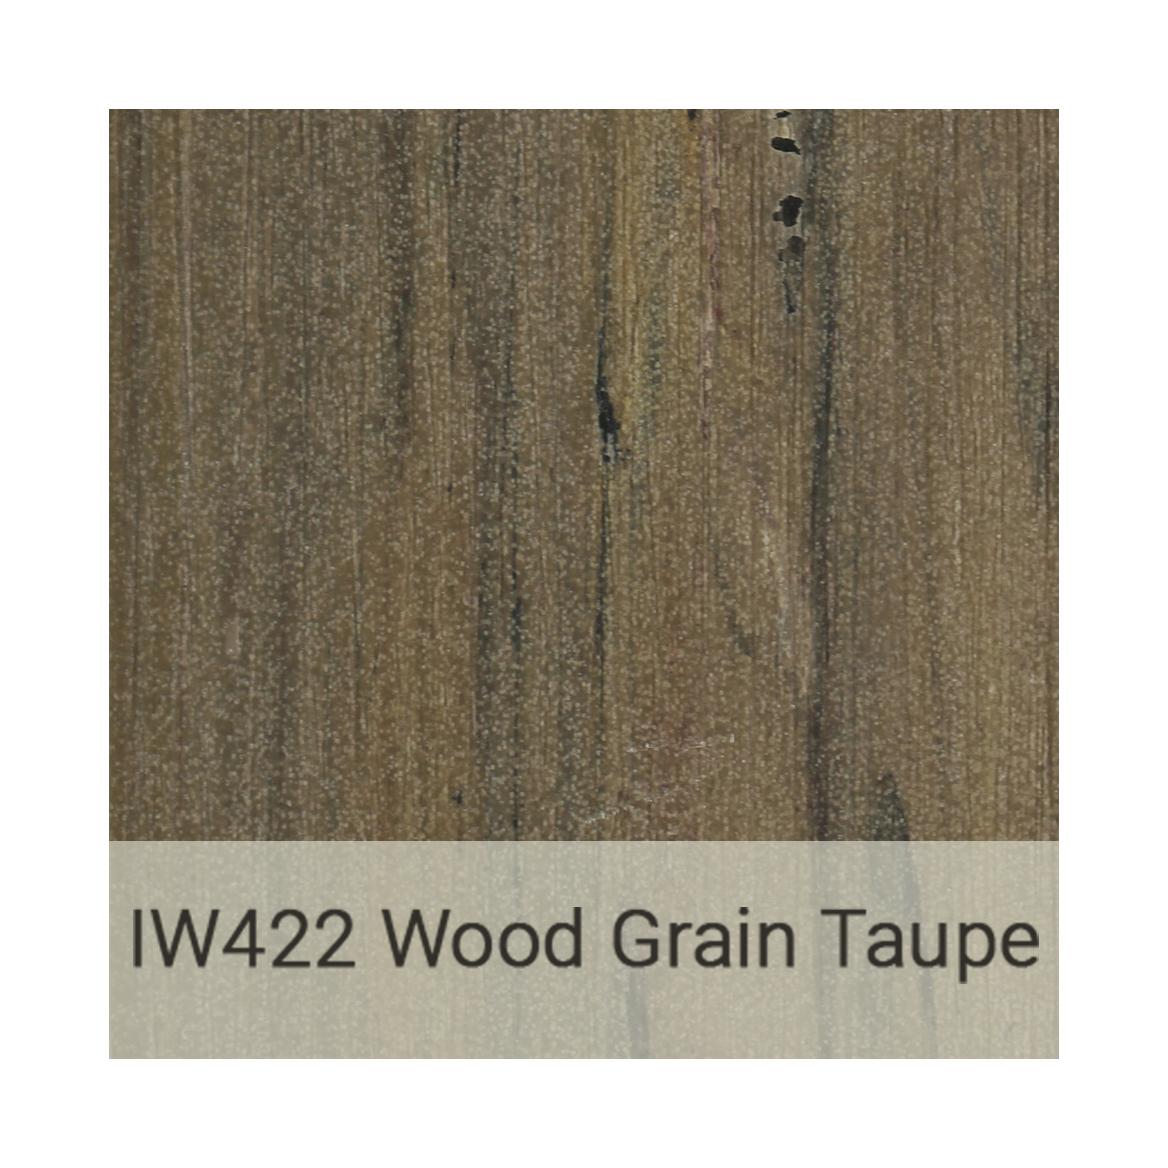 Kingston Casual infiniwood-iw422-wood-grain-taupe